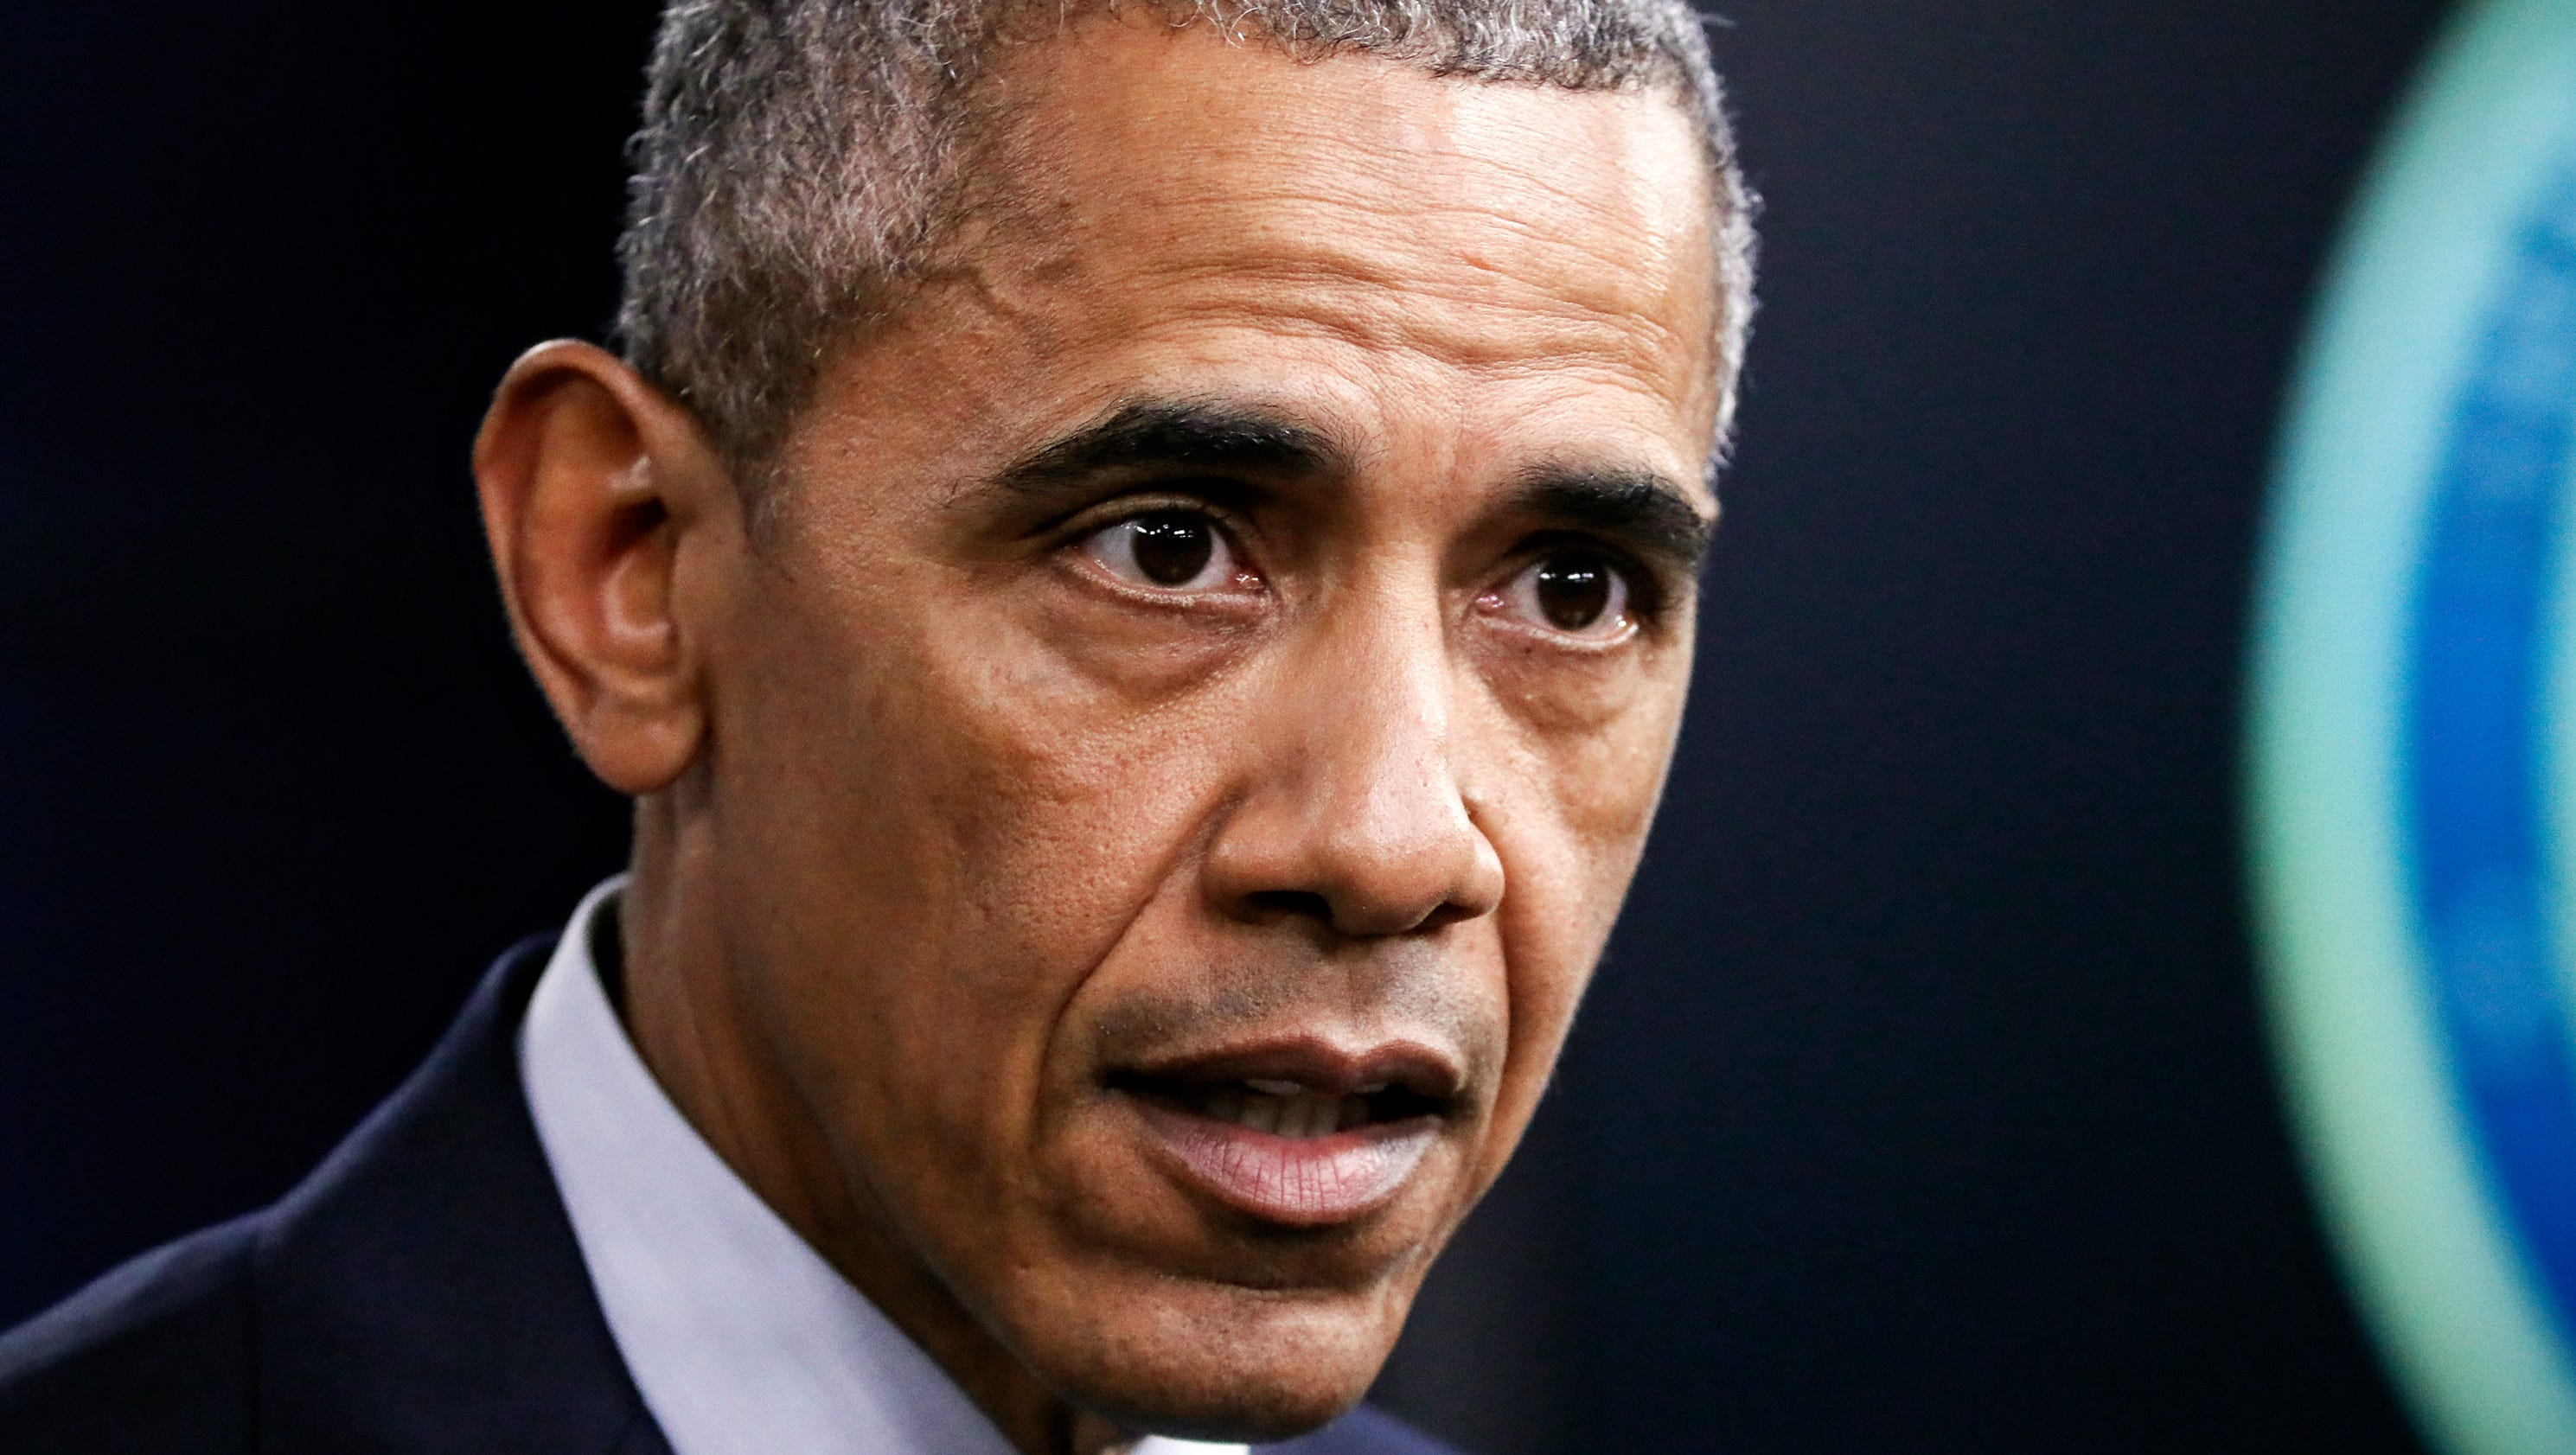 Obama will travel to Louisiana Tuesday to view flood damage